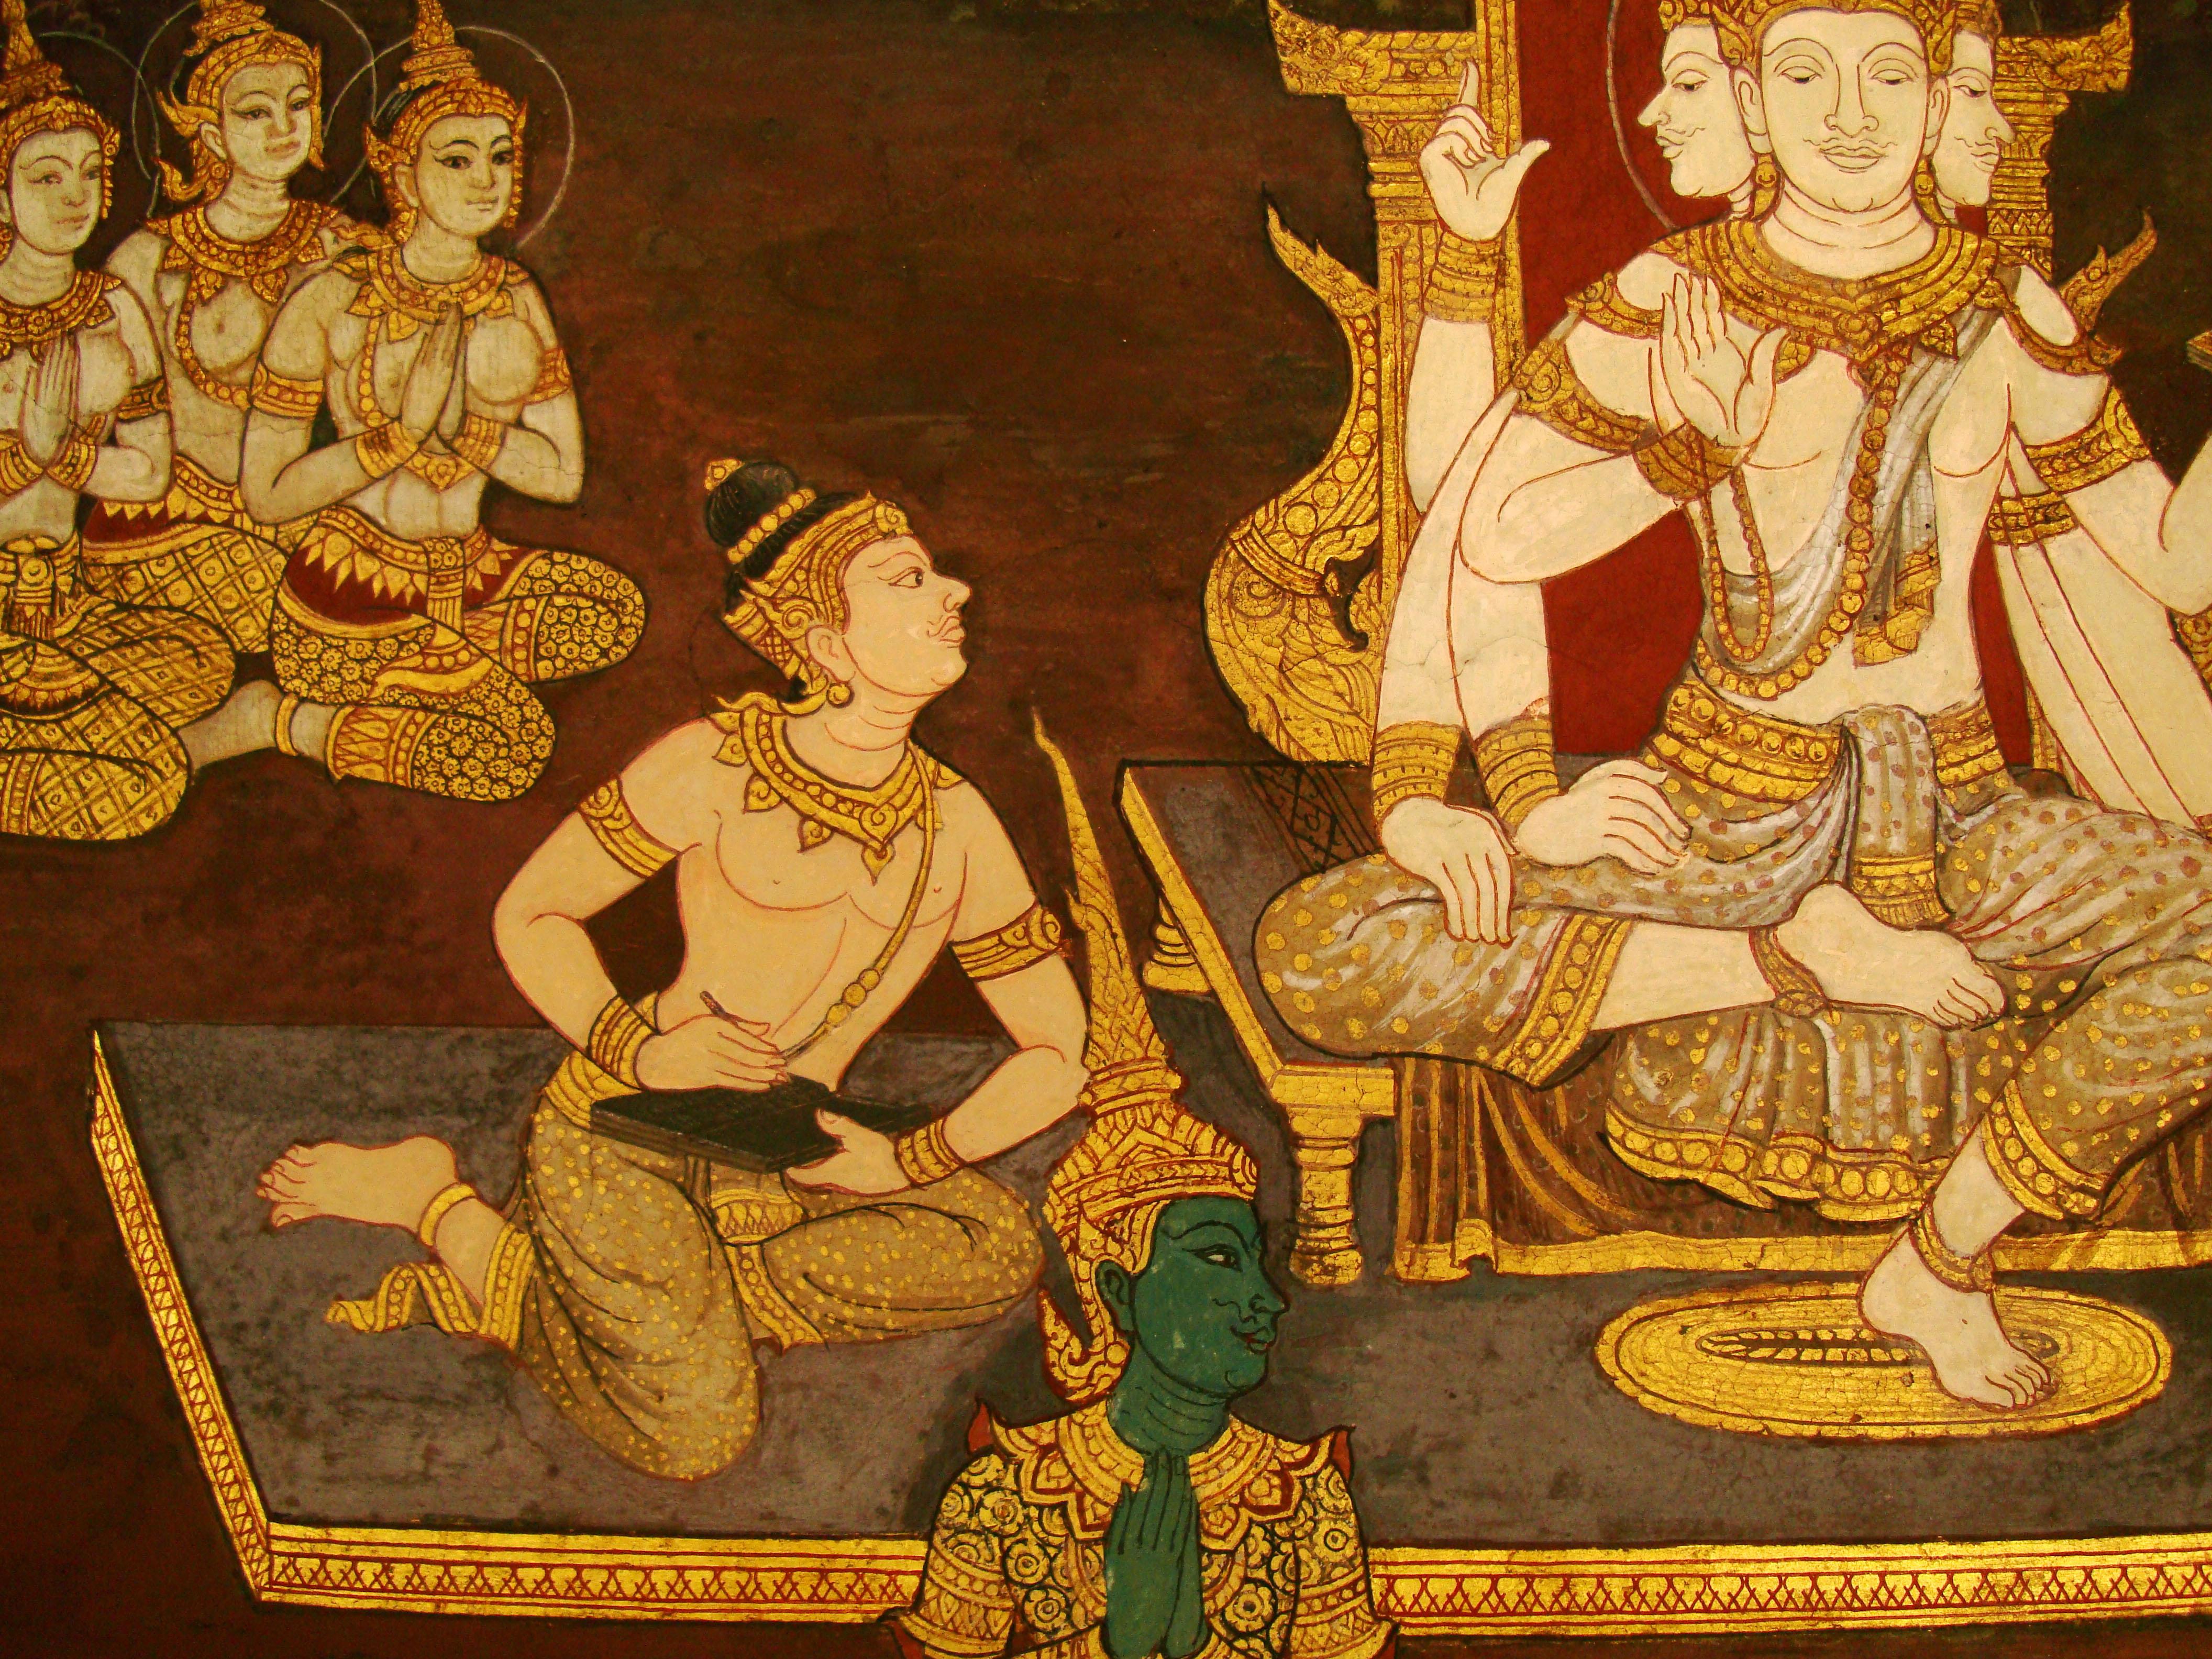 Grand Palace Gold leaf Buddhist artwork Bangkok Thailand 31